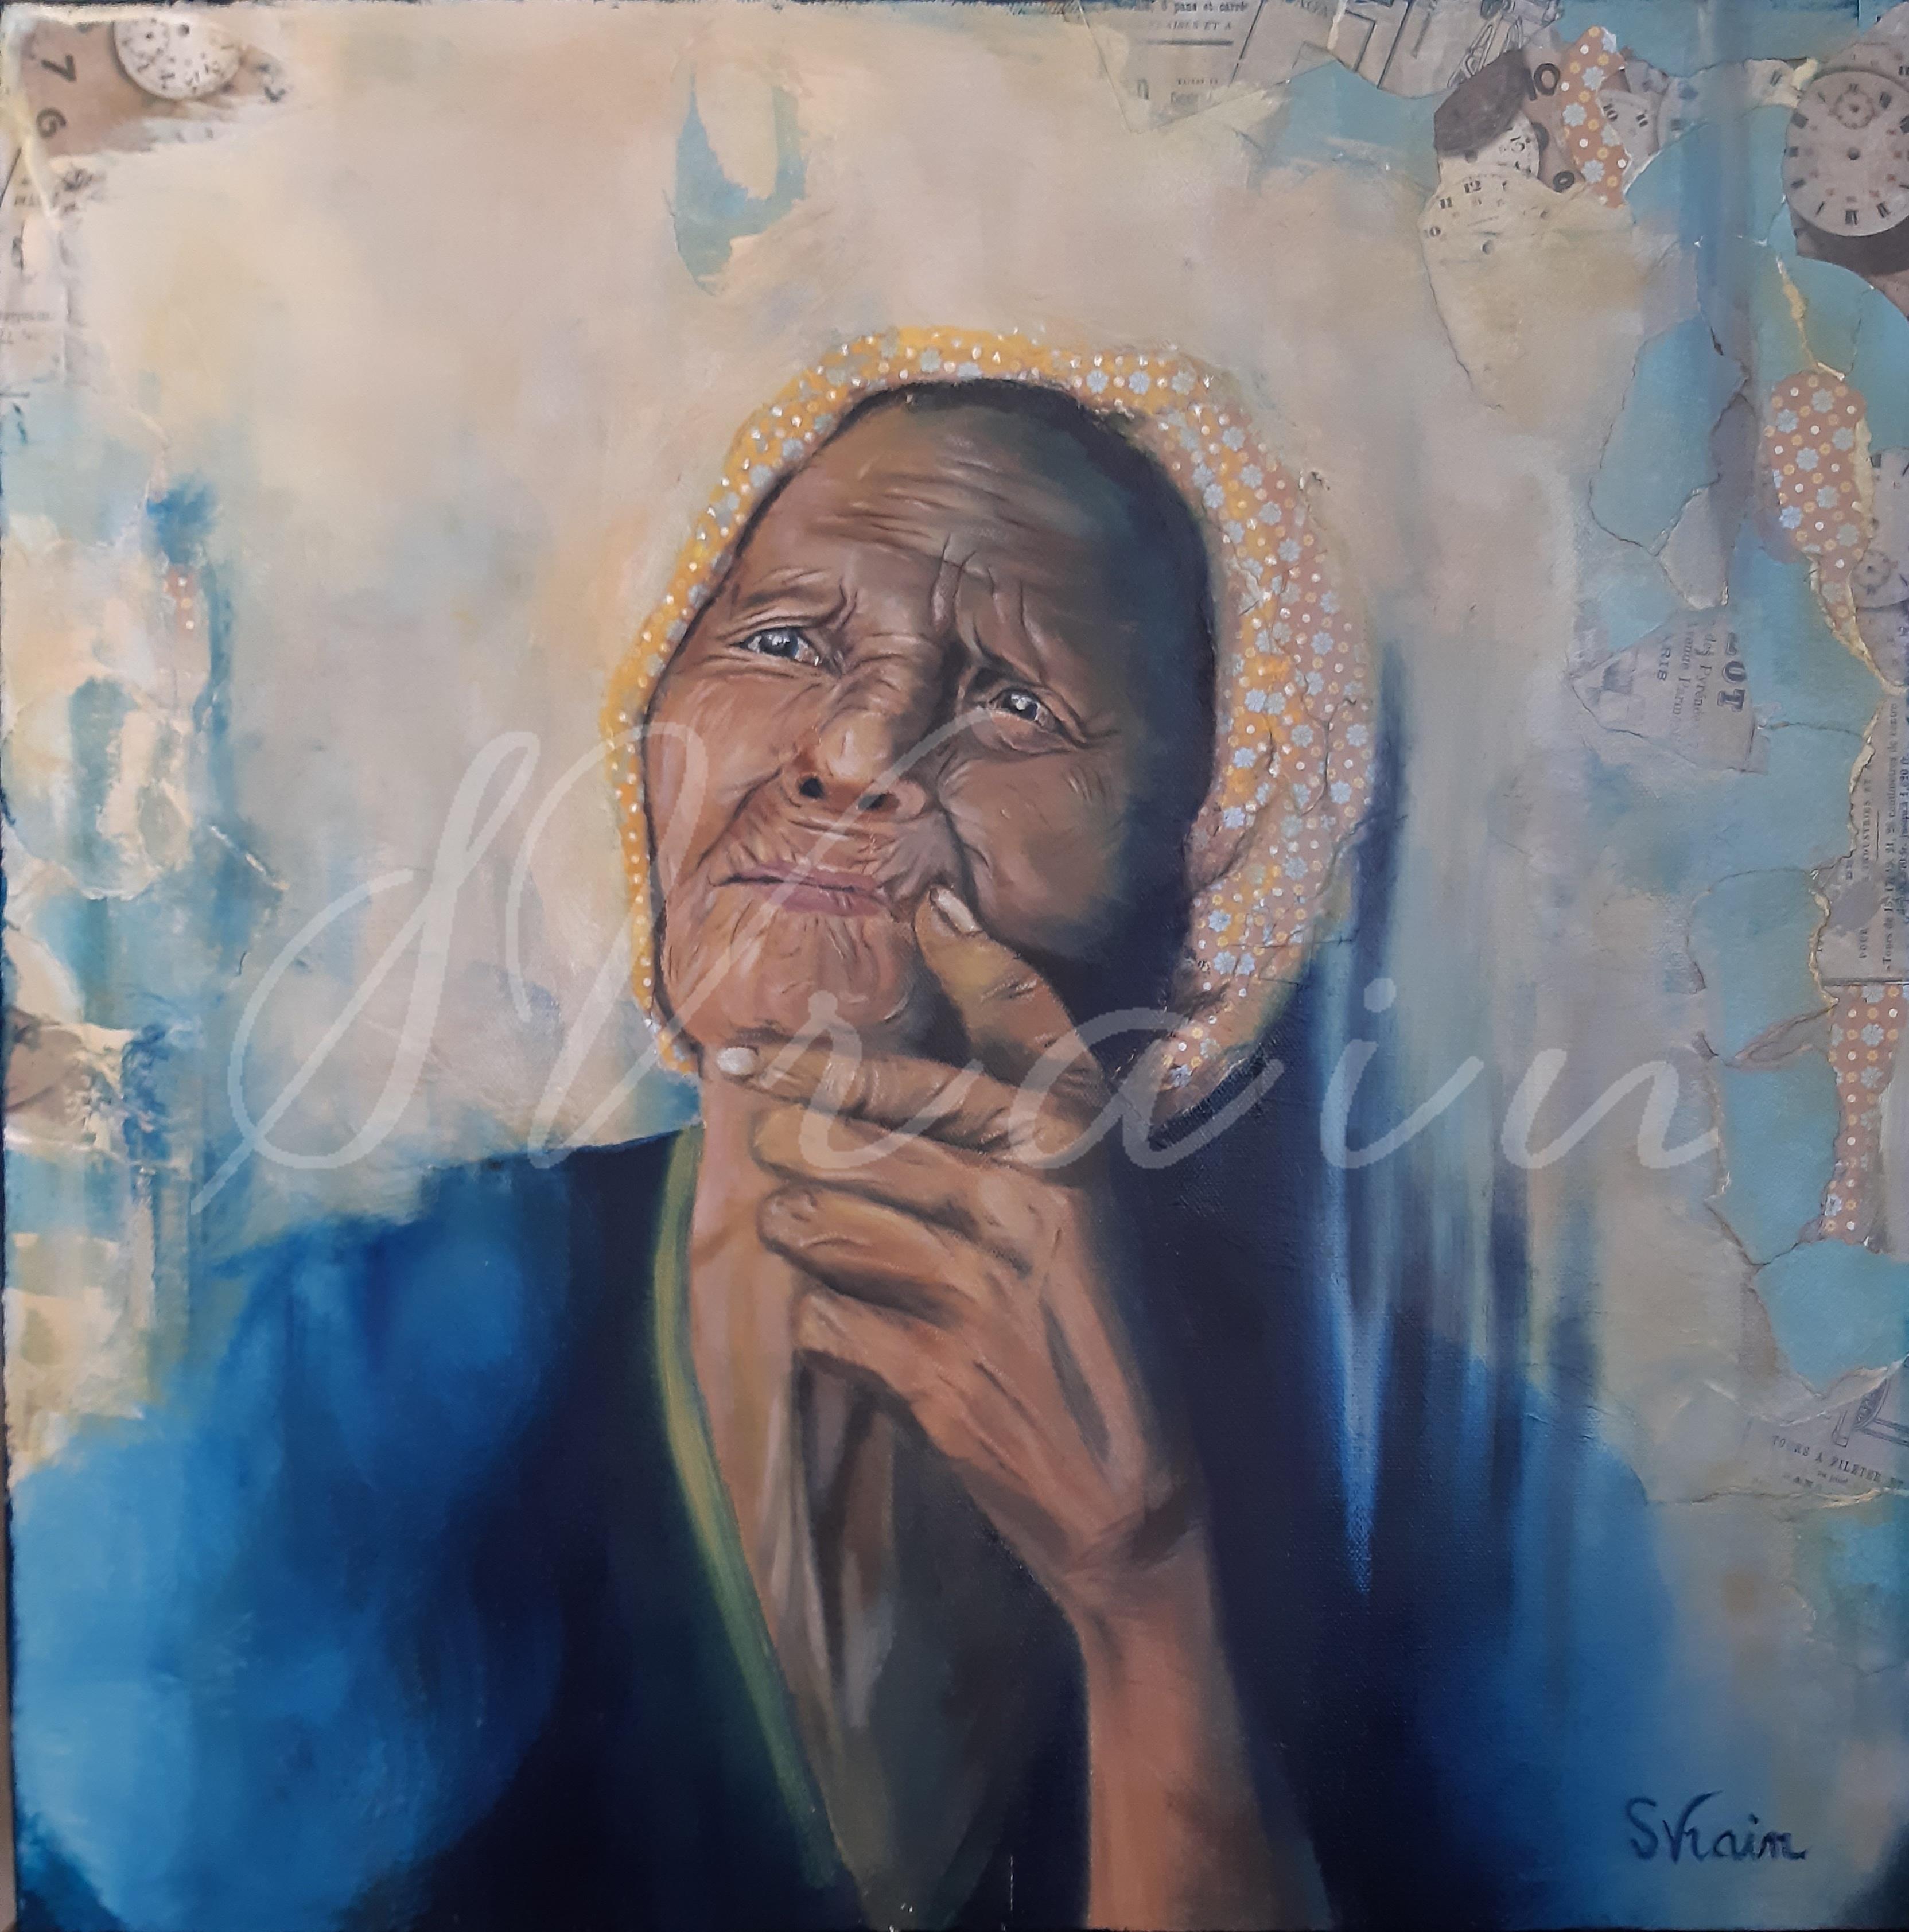 regard de vieille femme